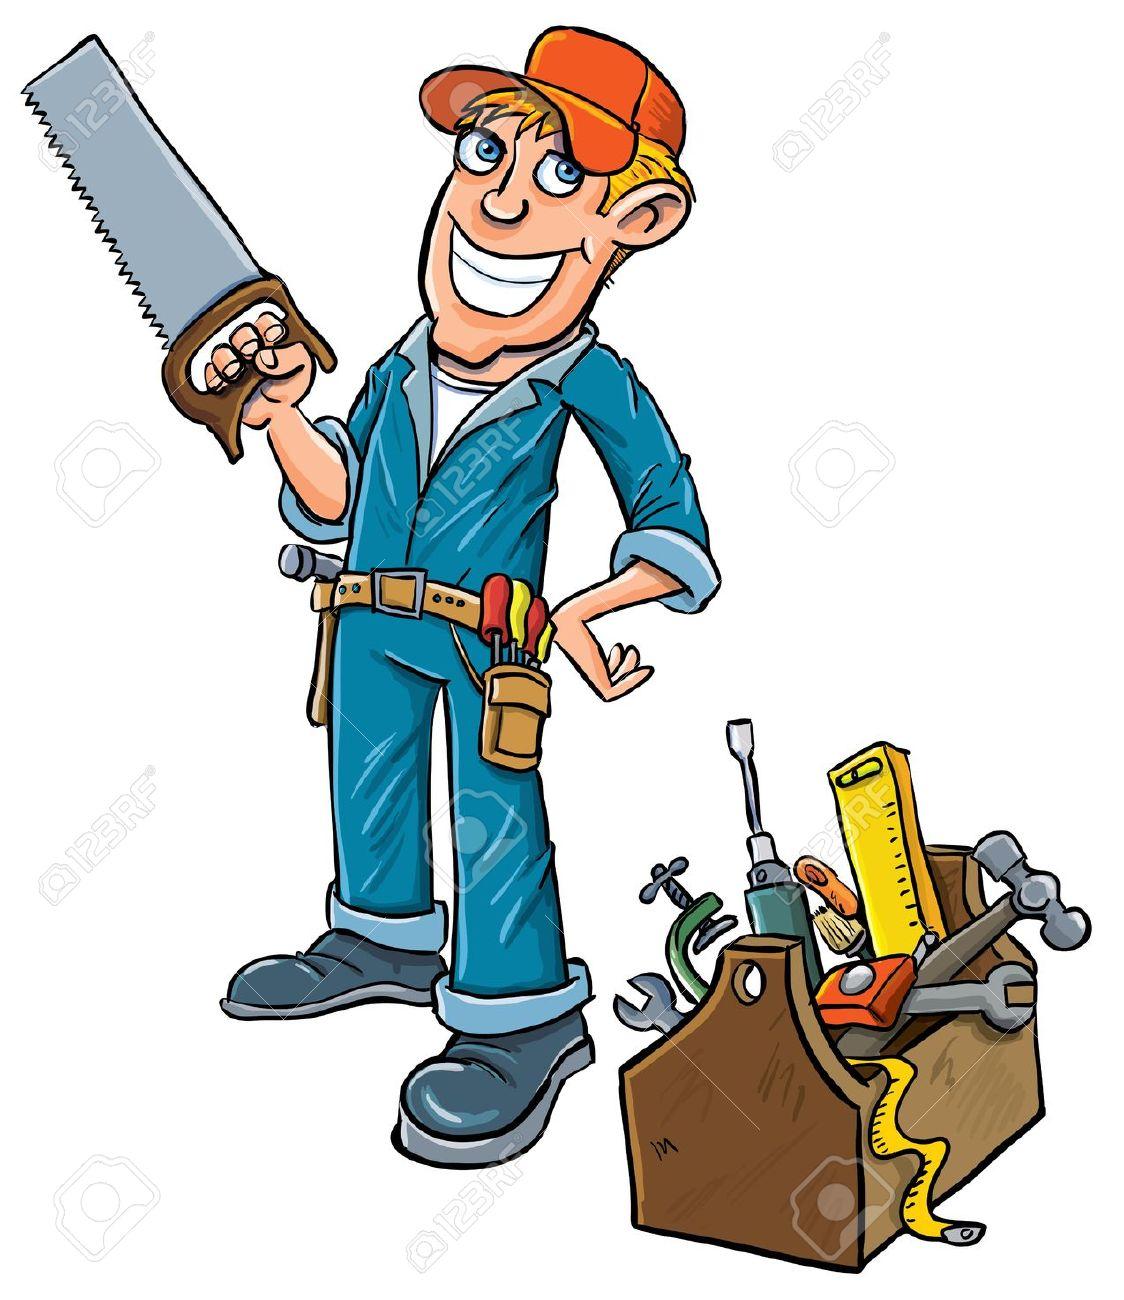 Handyman clipart. Cartoon